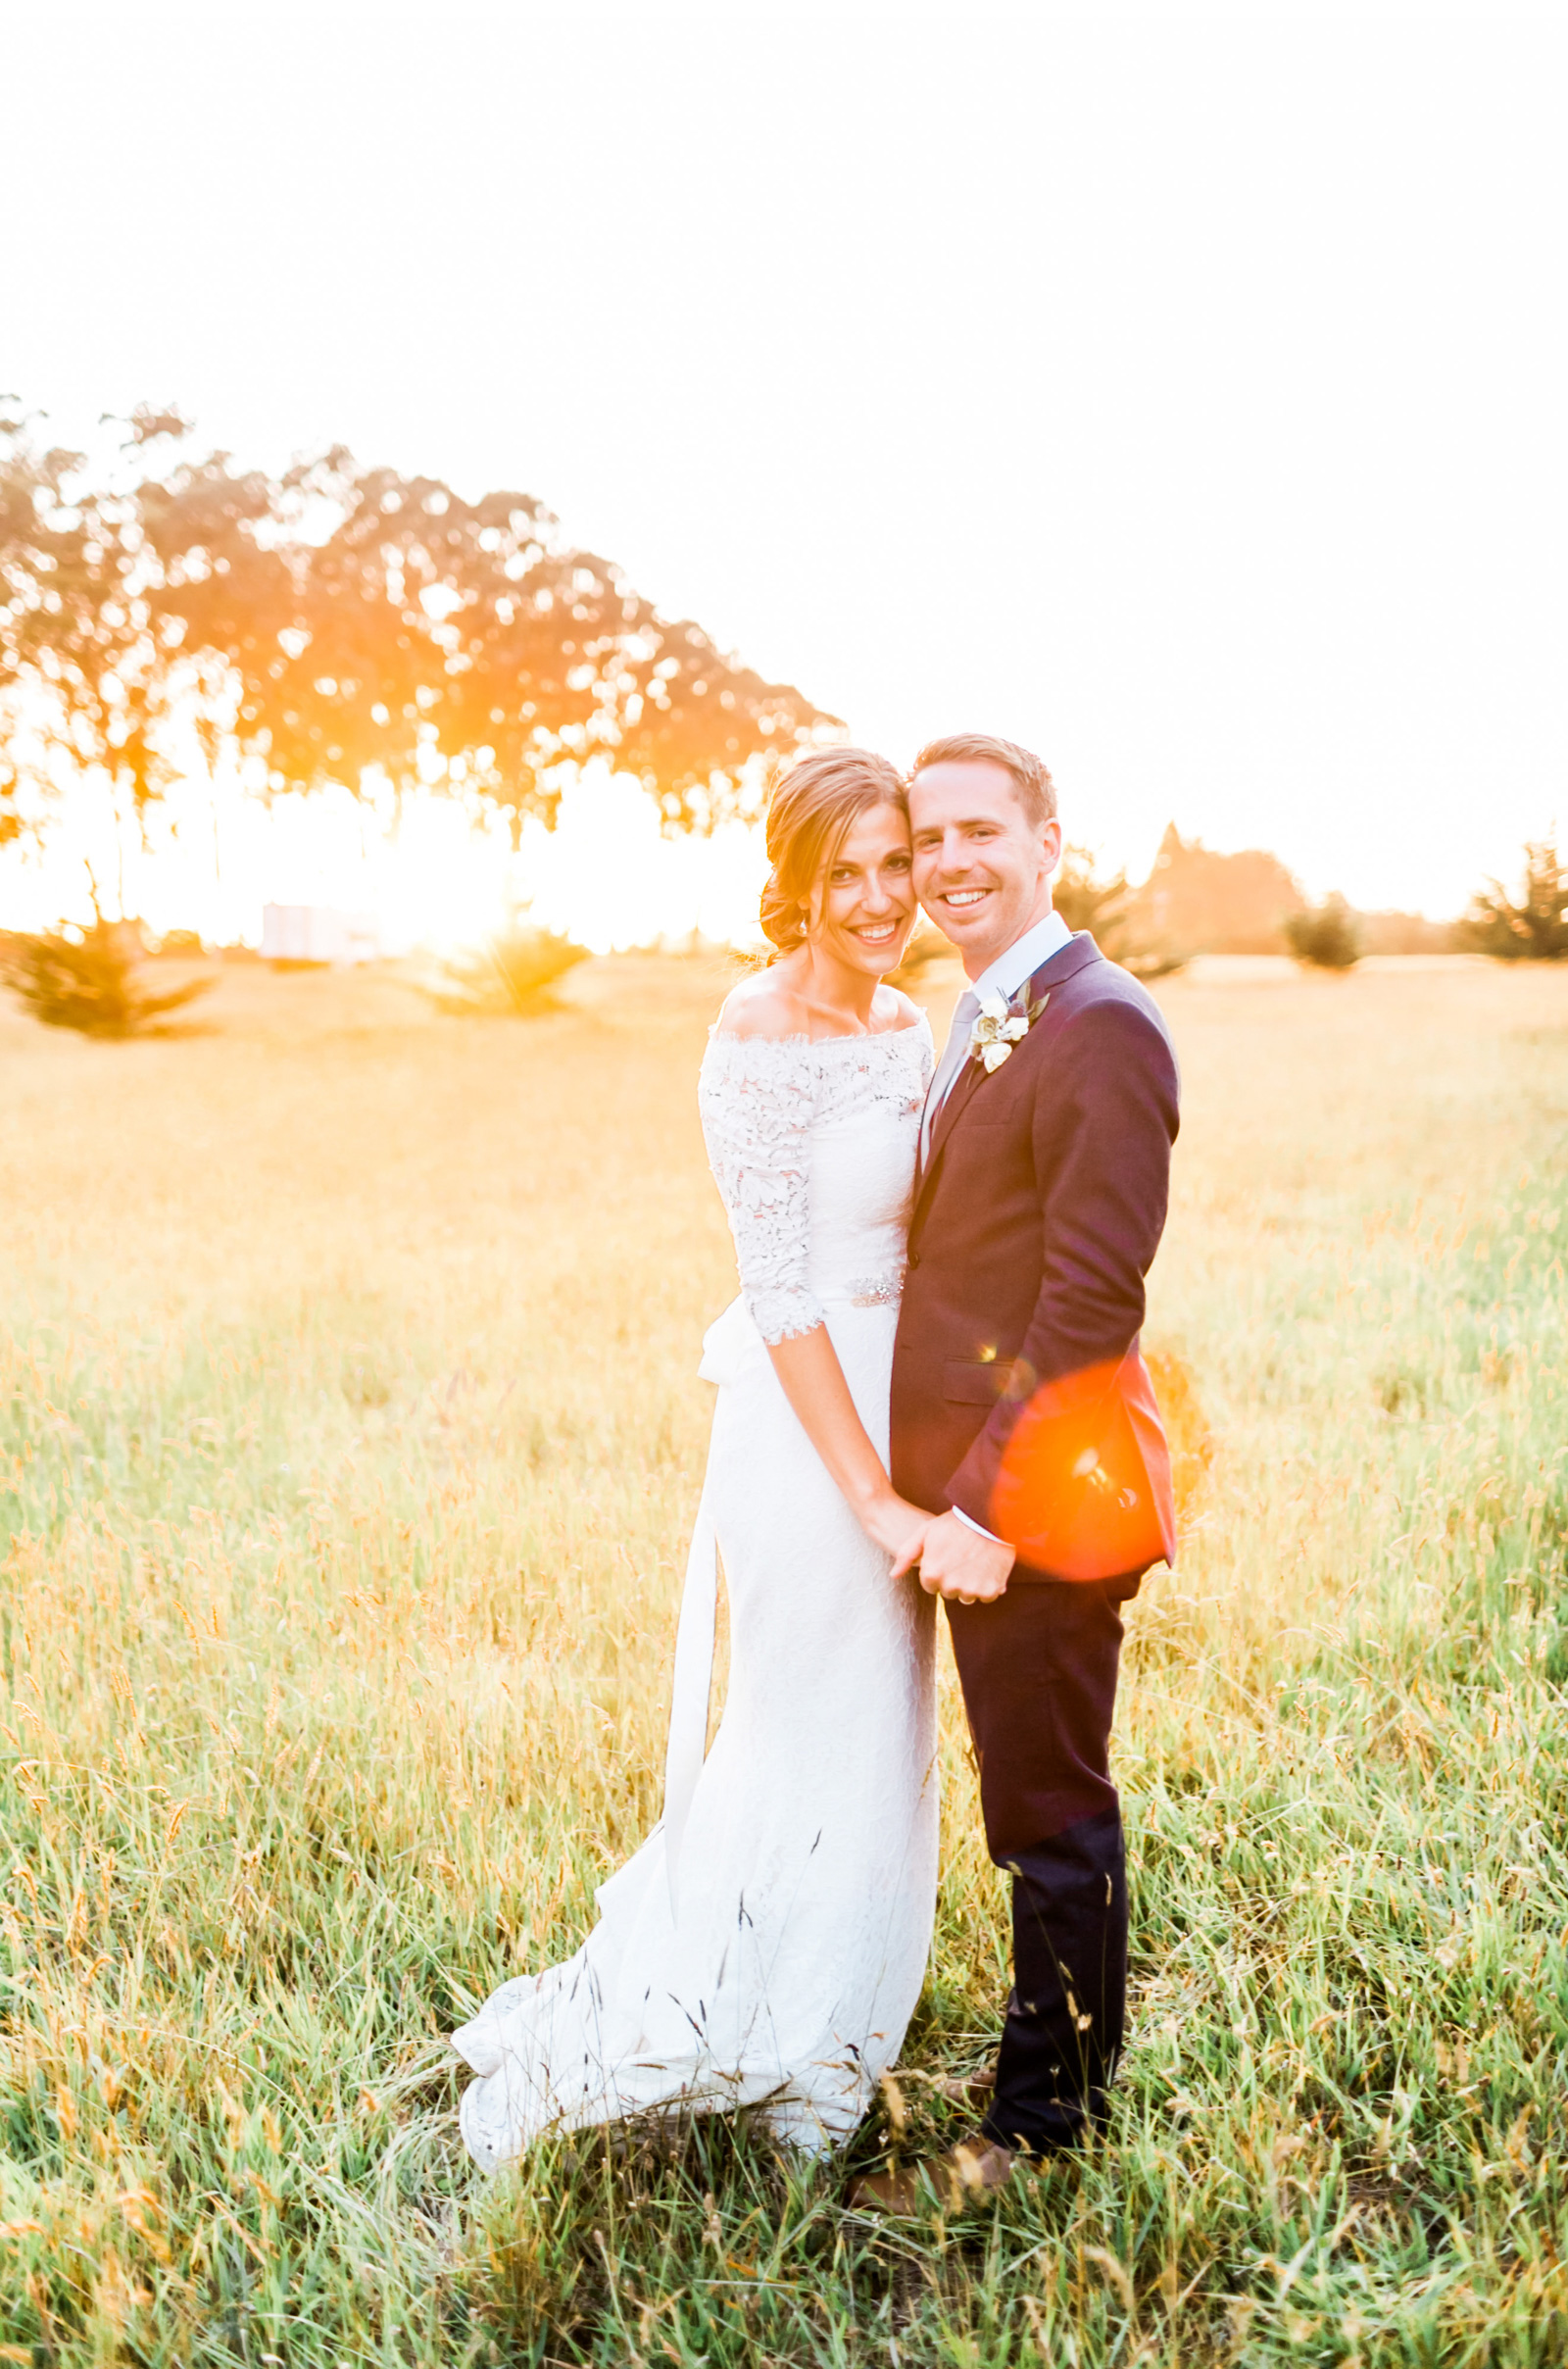 Natalie-Schutt-Photography-Adventure-Wedding-Mendocino_09.jpg